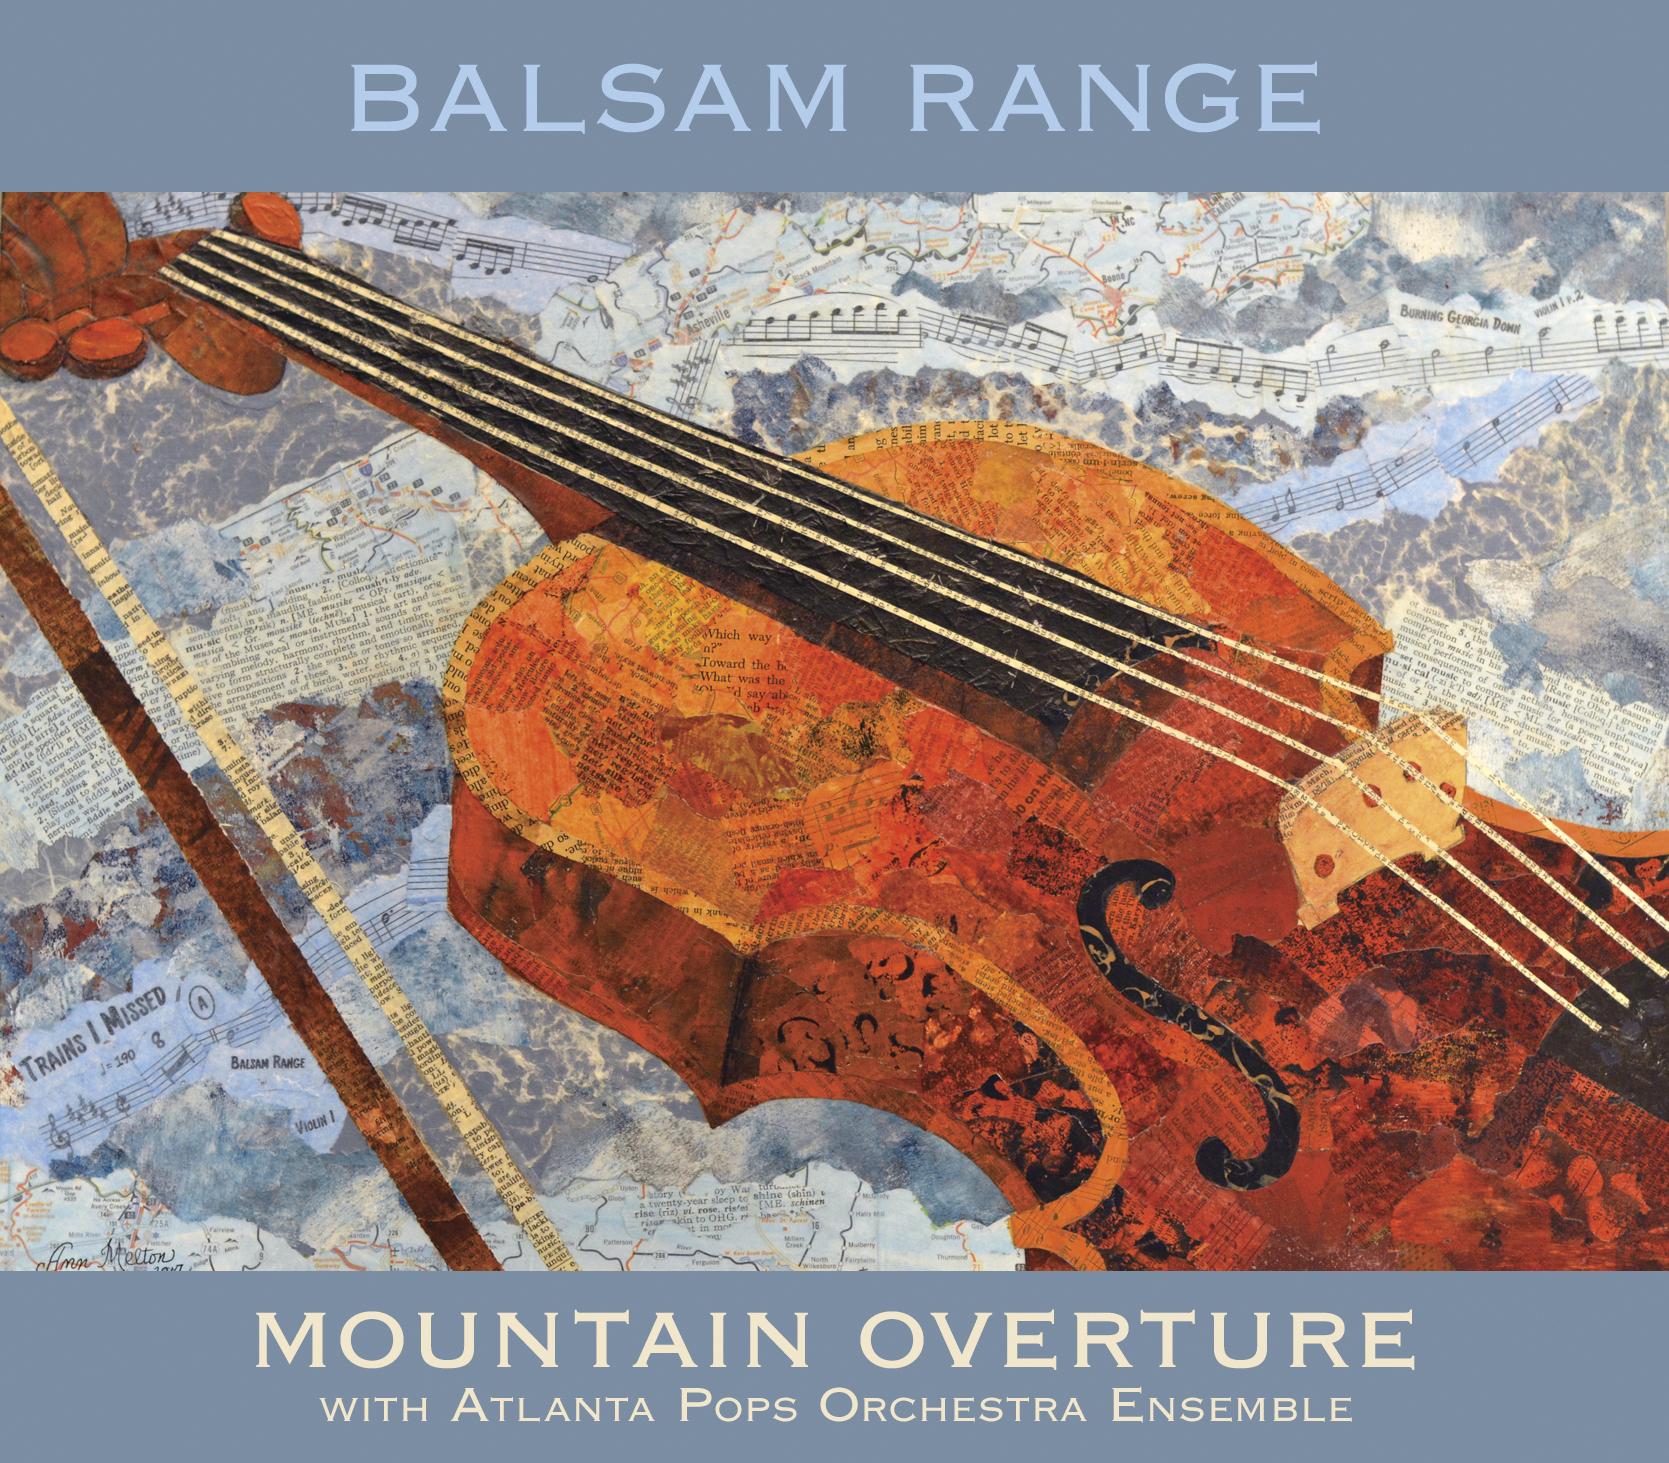 STREAM: Balsam Range with Atlanta Pops Orchestra Ensemble, 'Mountain Overture'